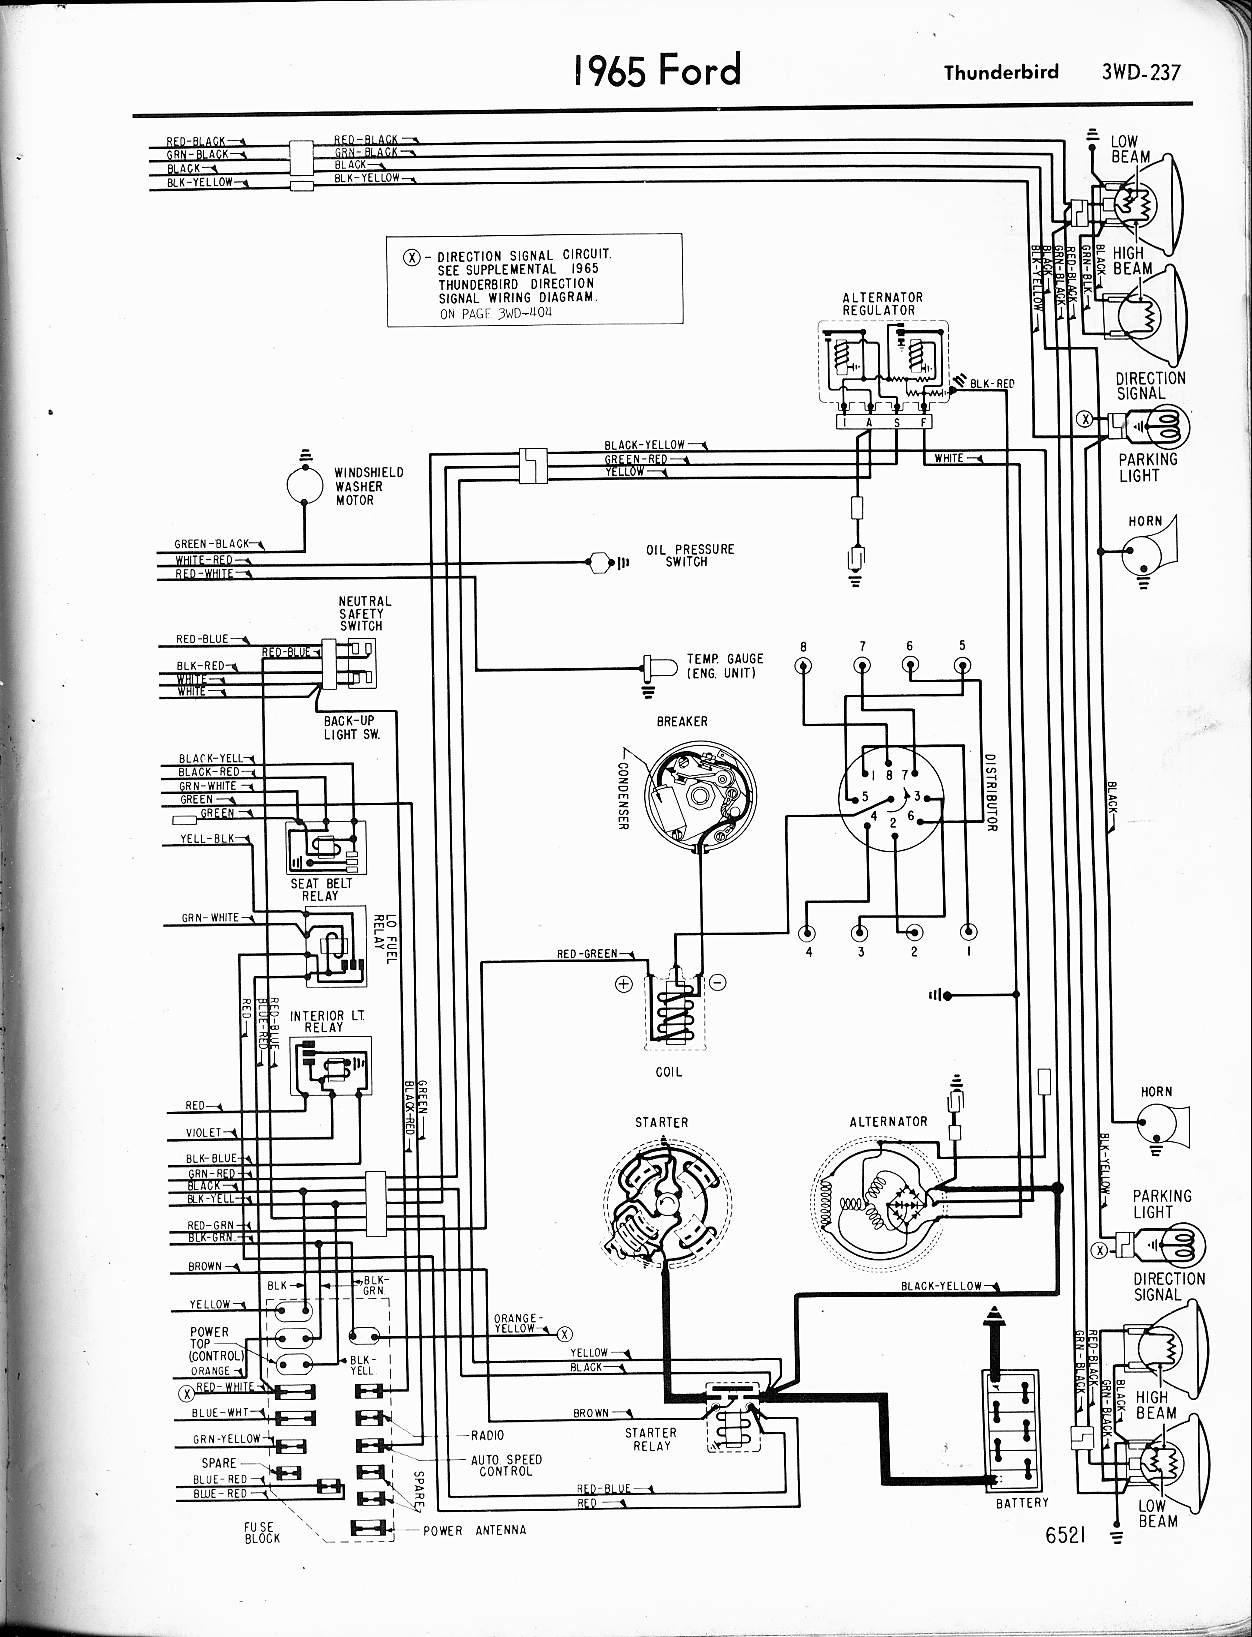 Superb 1964 Thunderbird Wiring Diagram Car Wiring Diagram Wiring Cloud Itislusmarecoveryedborg